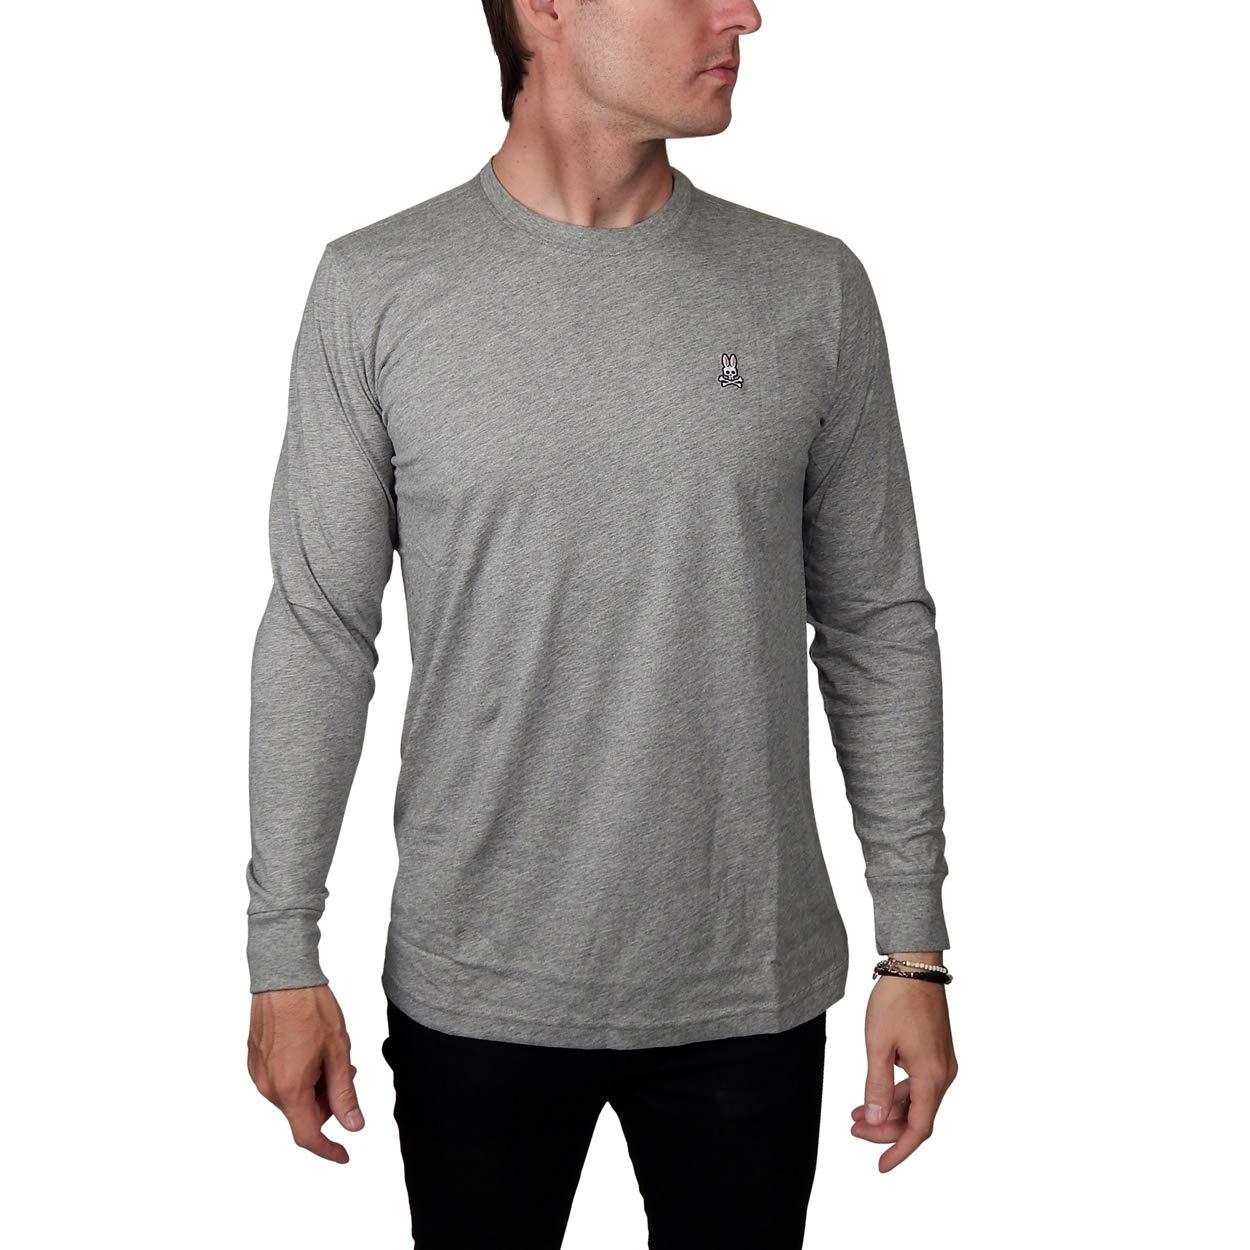 Psycho Bunny Mens Psycho Long Sleeved T-Shirt in Heather Grey